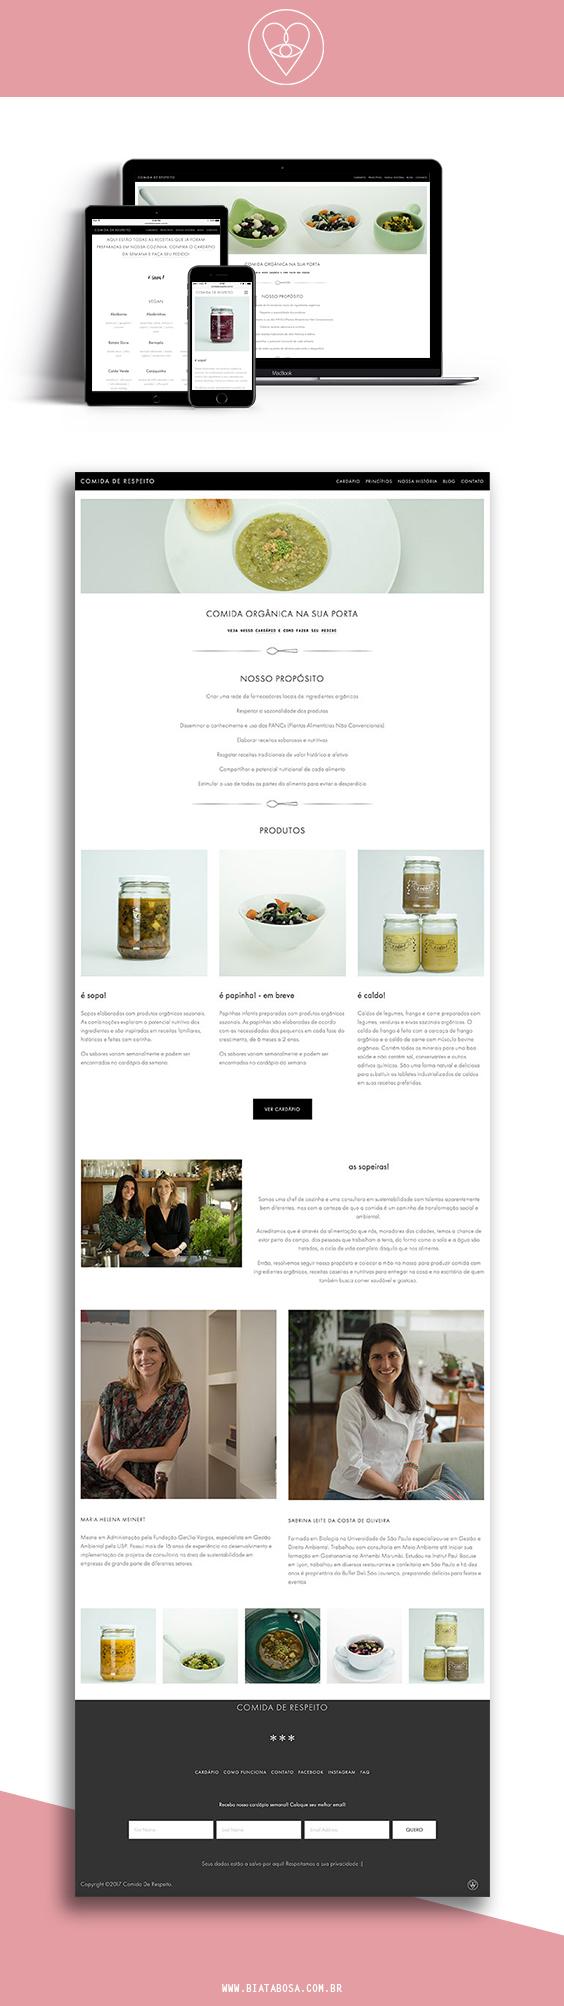 modelo-portfolio-pinterest-comida-de-respeito.jpg